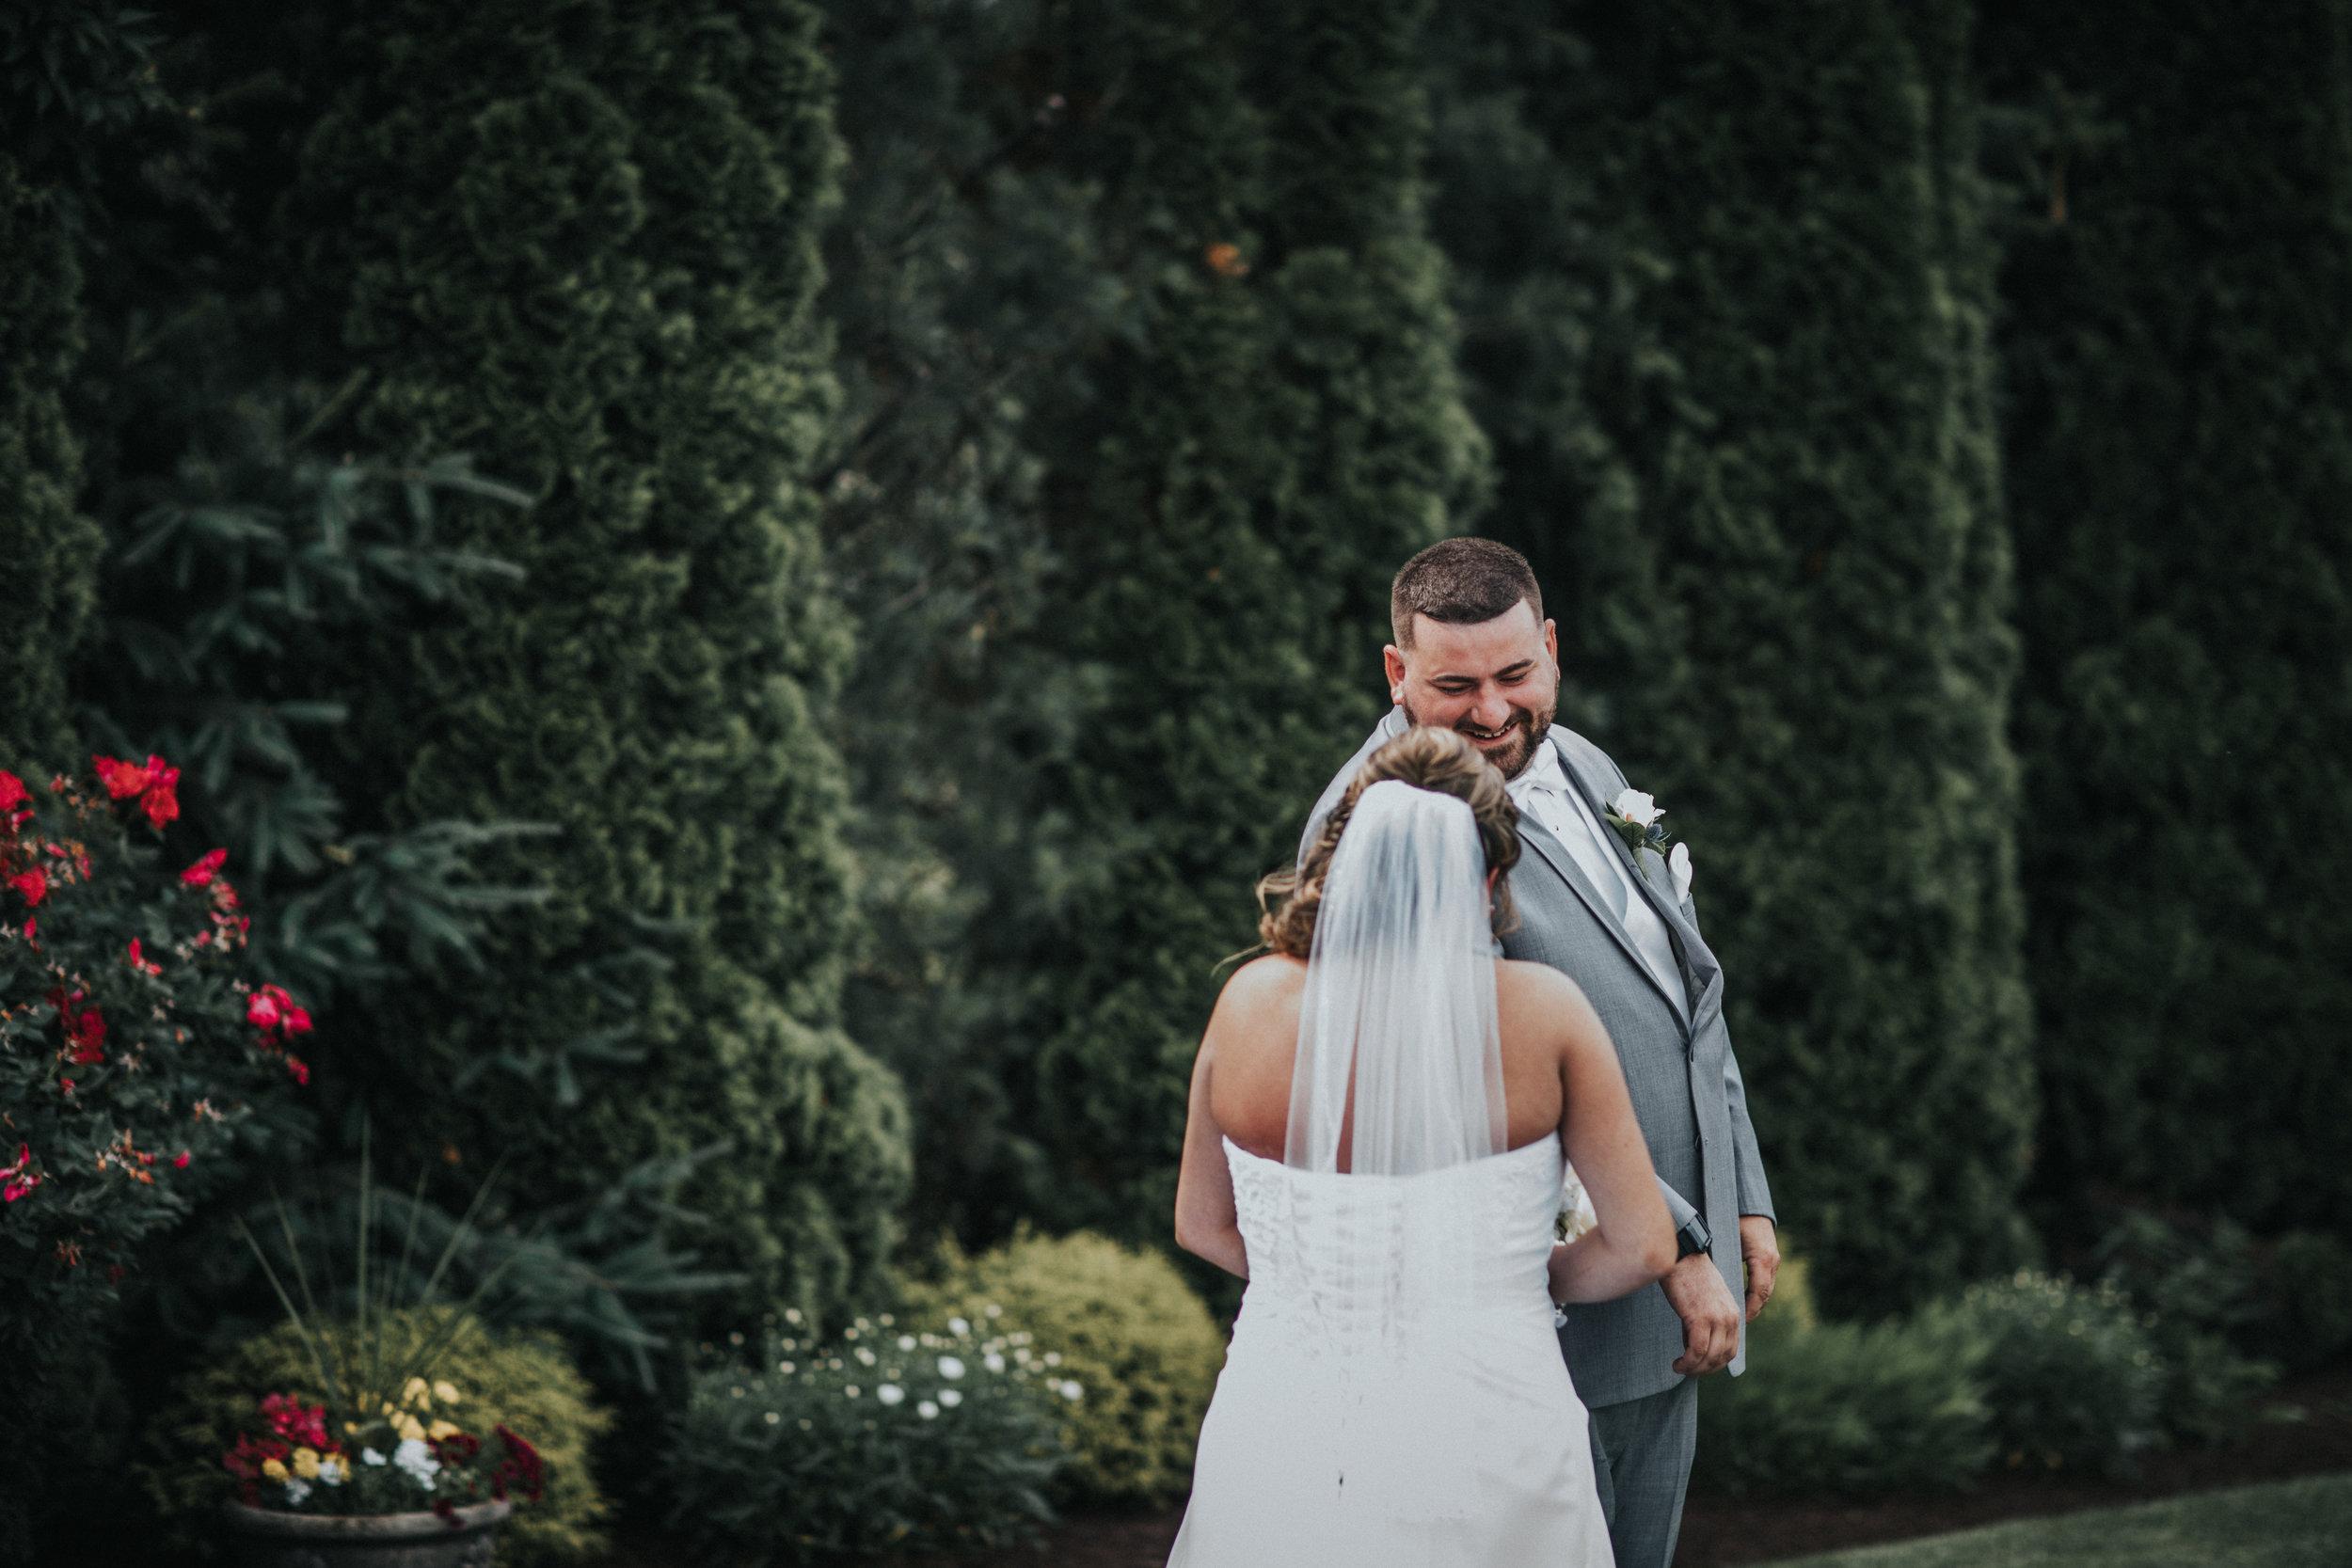 New-Jersey-Wedding-Photographer-JennaLynnPhotography-ValenzanoWinery-FirstLook-2.jpg